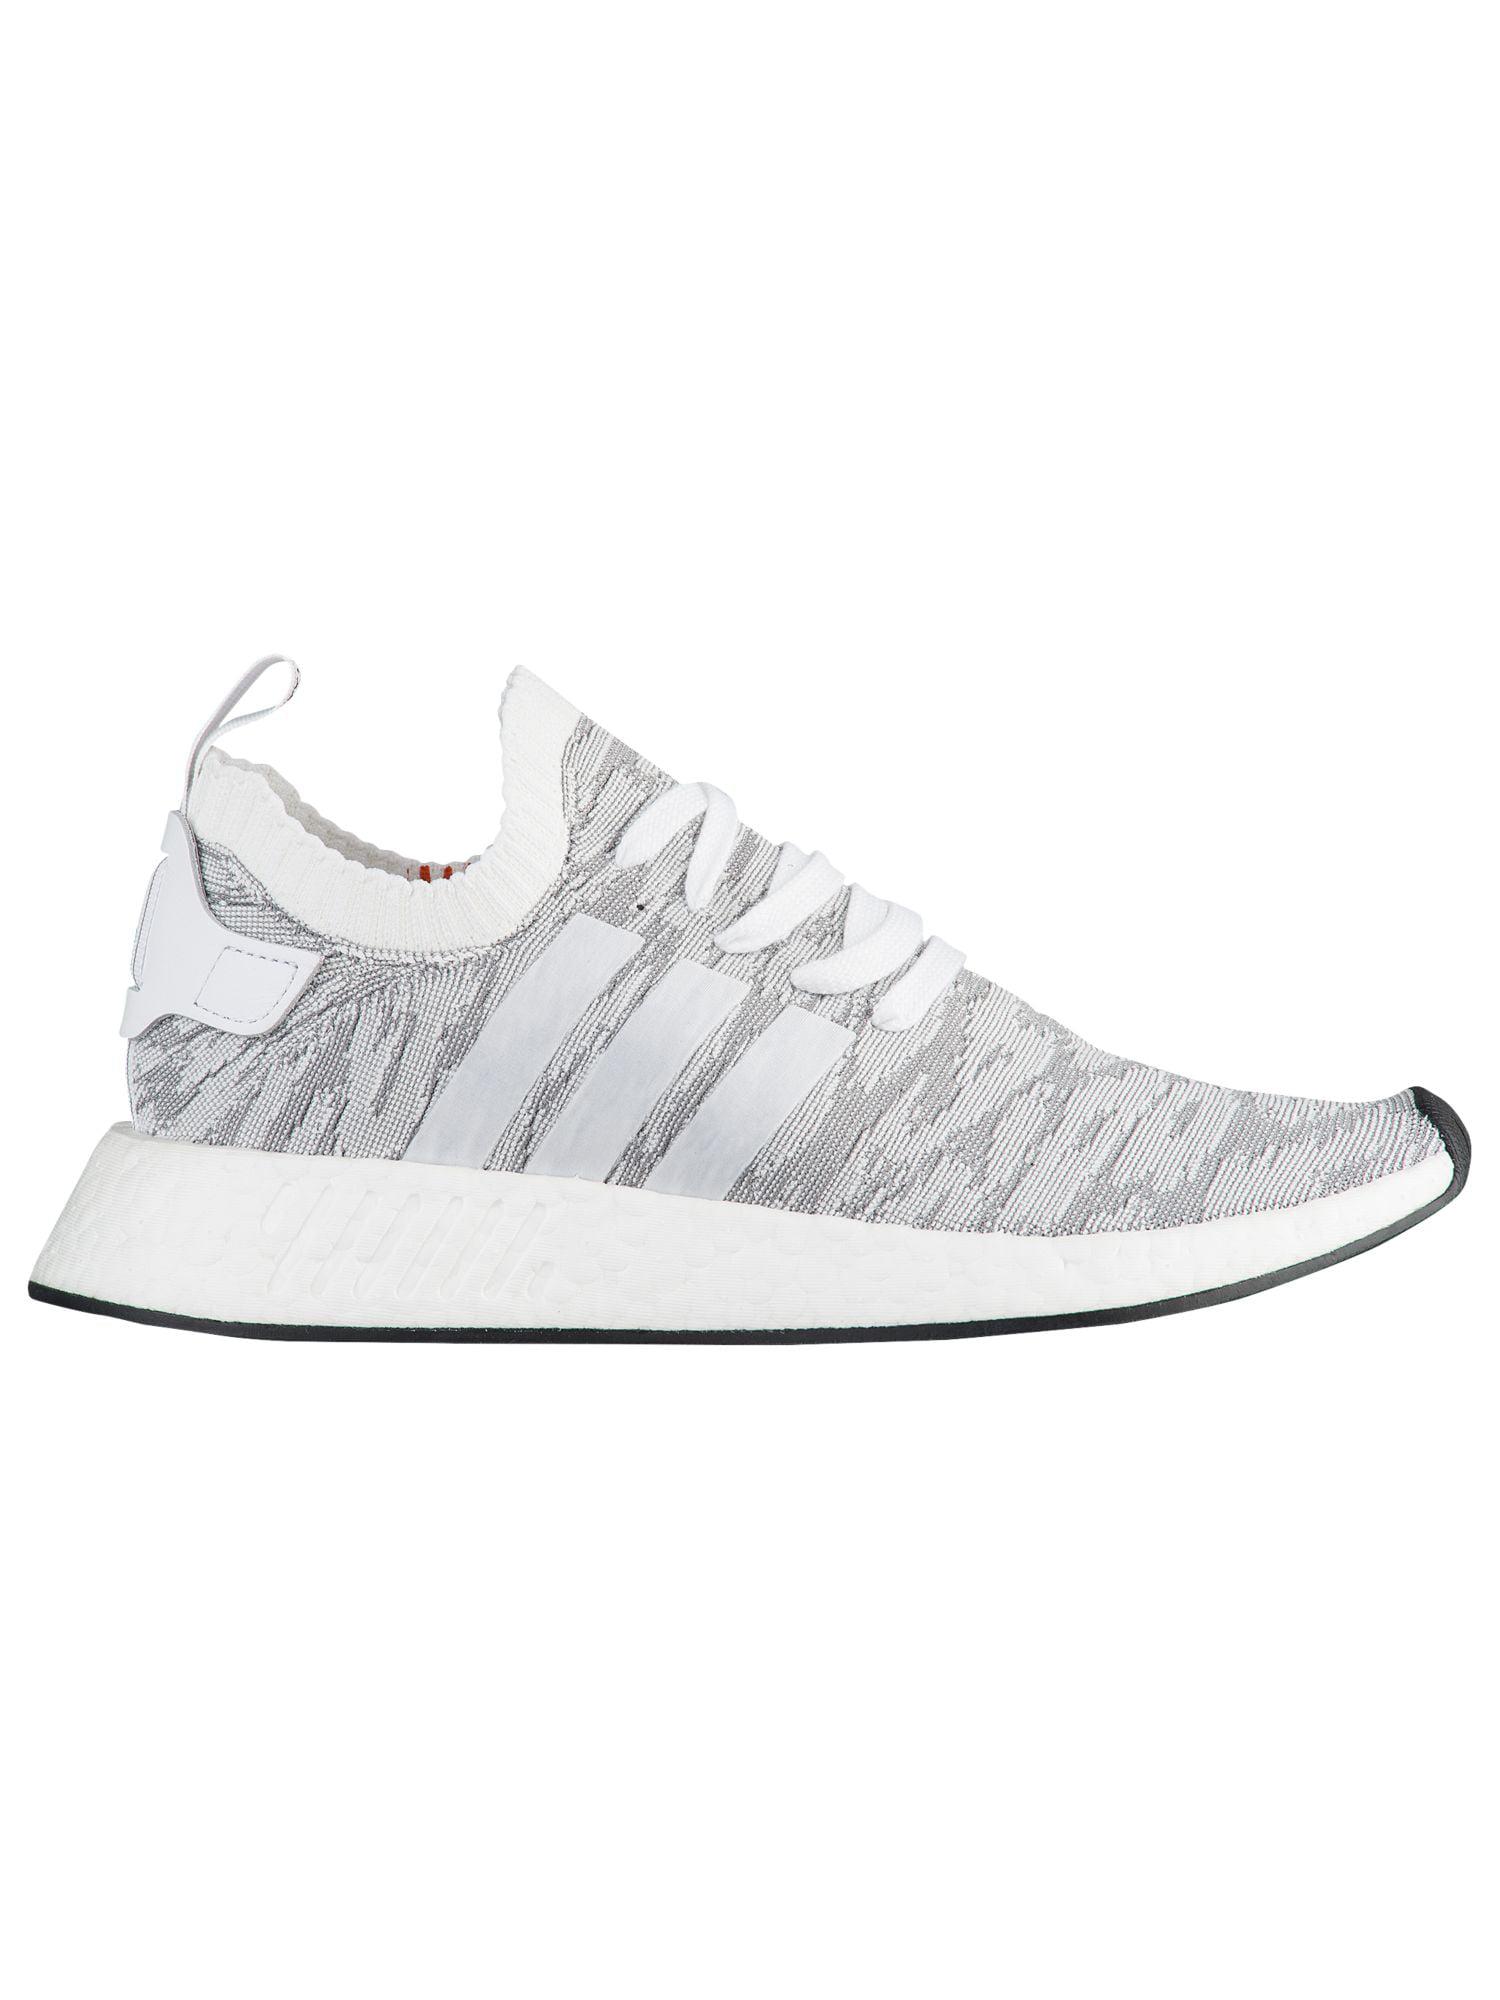 adidas Originals NMD R2 Primeknit Men's Running Shoes WhiteWhiteBlack